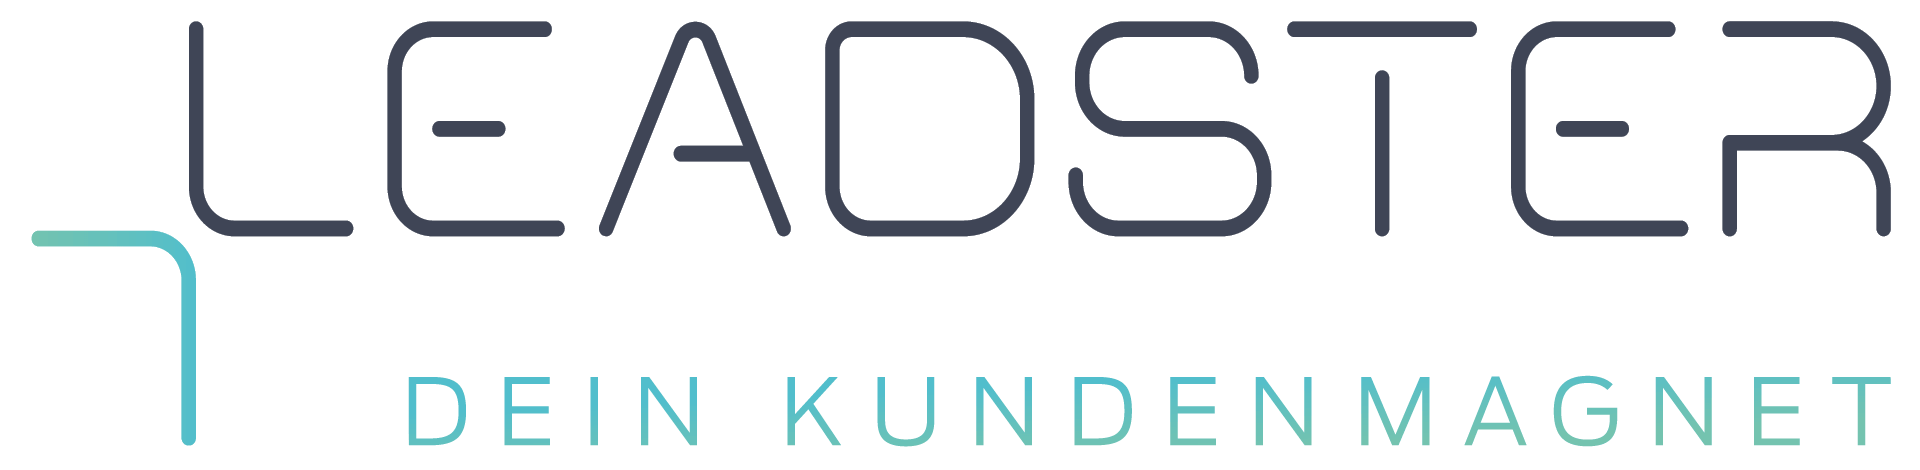 Leadster Logo